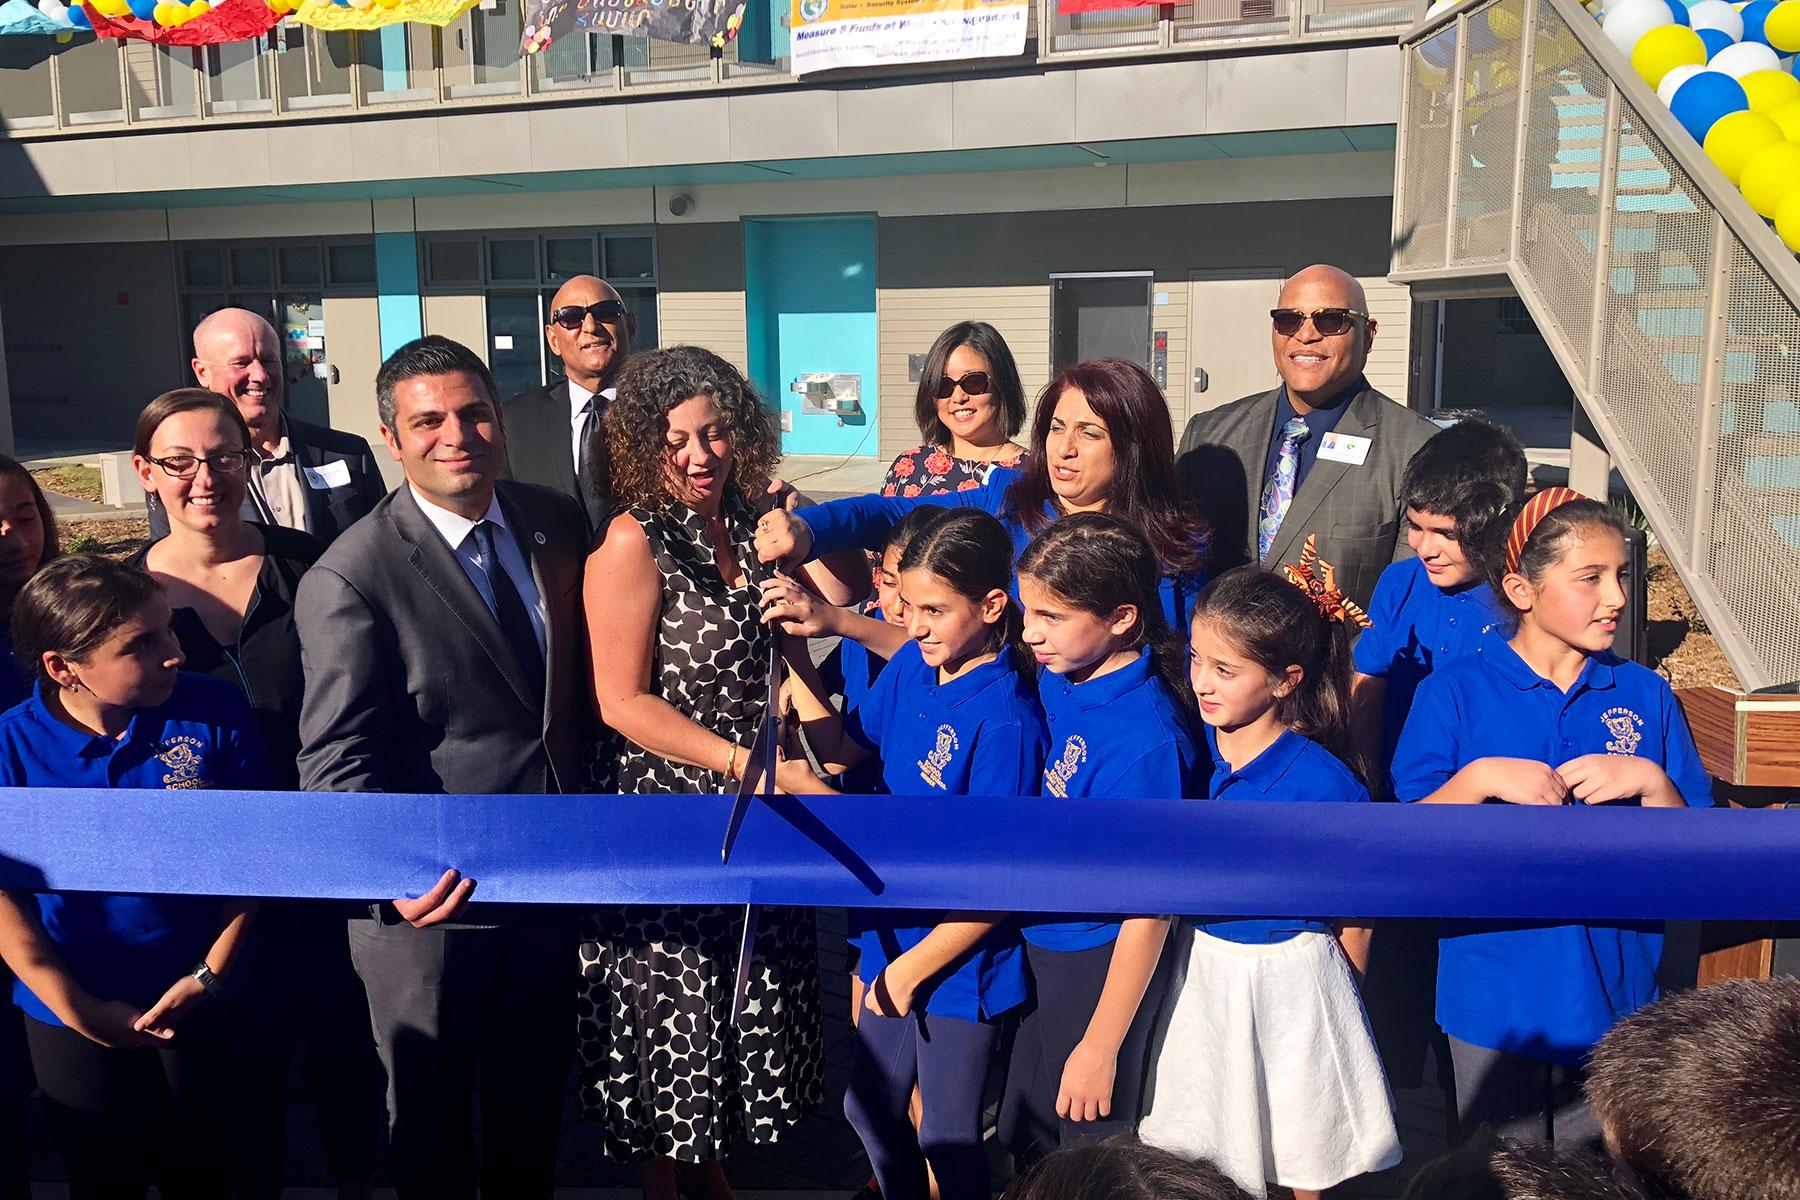 Jefferson Elementary School Measure S Ribbon Cutting Ceremony October 2018